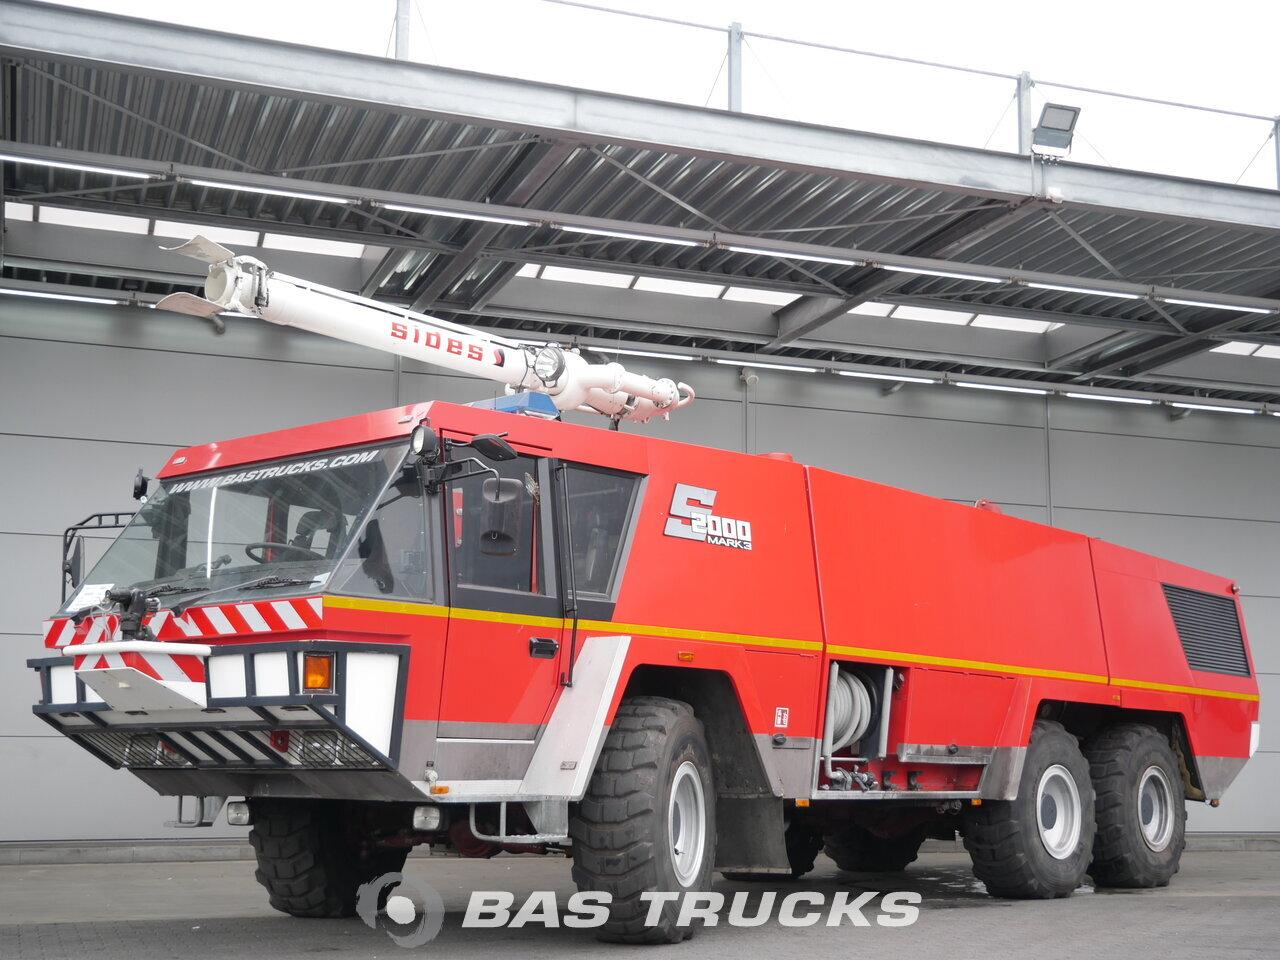 For sale at BAS Trucks: Mercedes Crashtender Sides Airport fire truck 6X6  06/1995